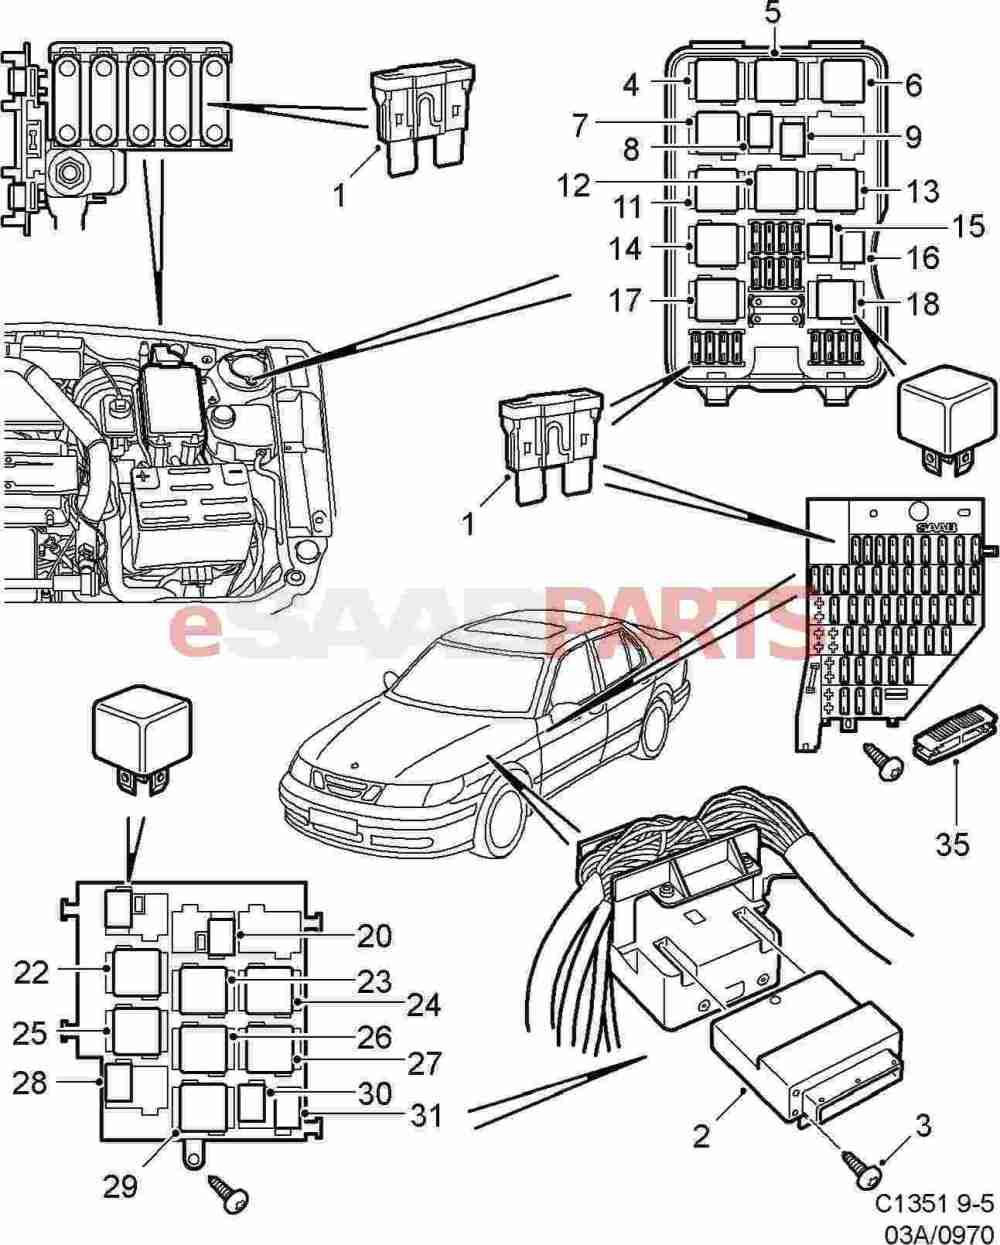 medium resolution of  2005 saab 9 3 fuse box wiring diagram and fuse box